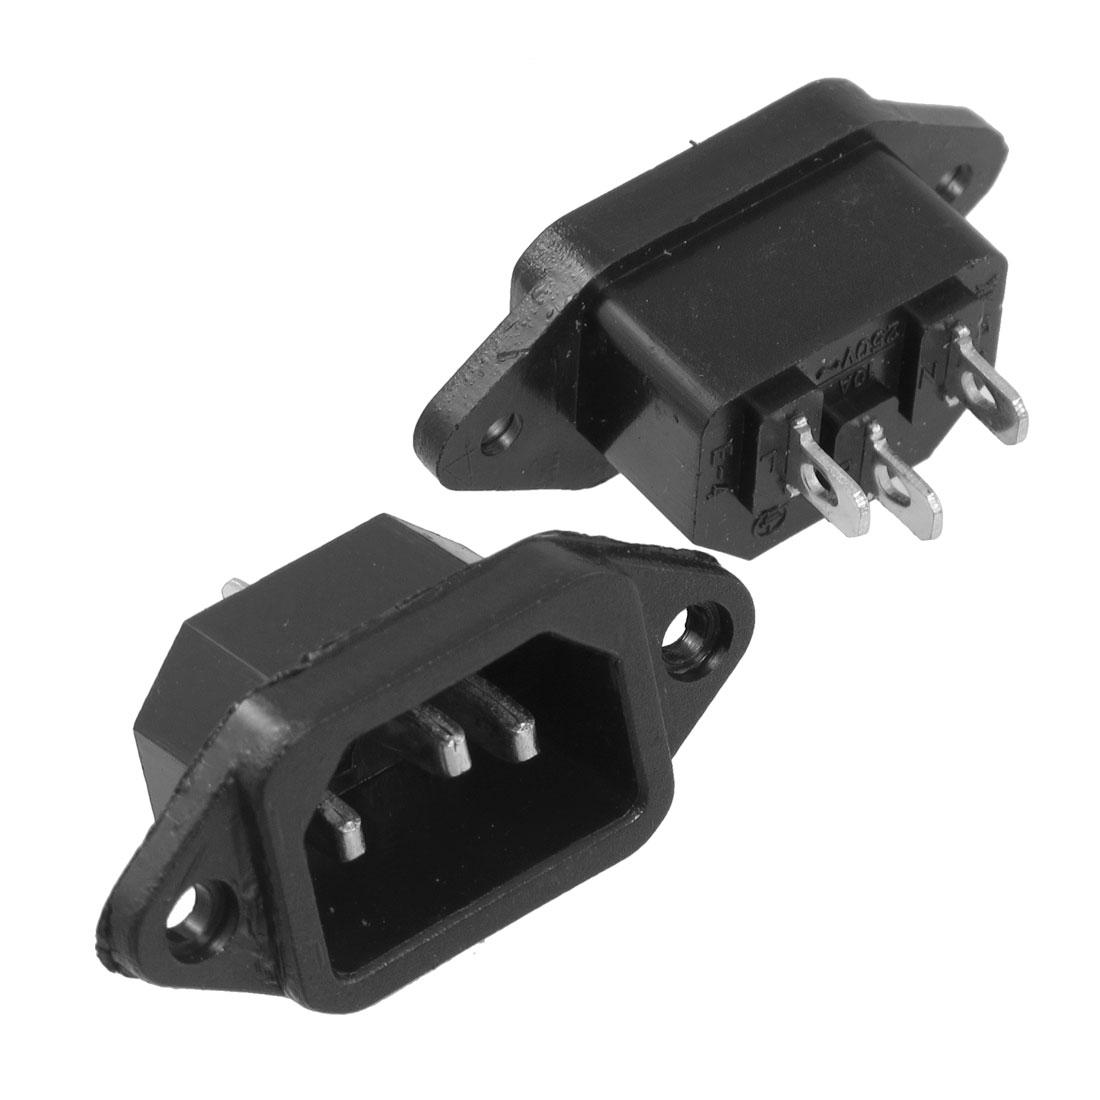 3 Pcs AC 250V 10A 3 Terminals C14 Connector Inlet Power Socket Adapter Black